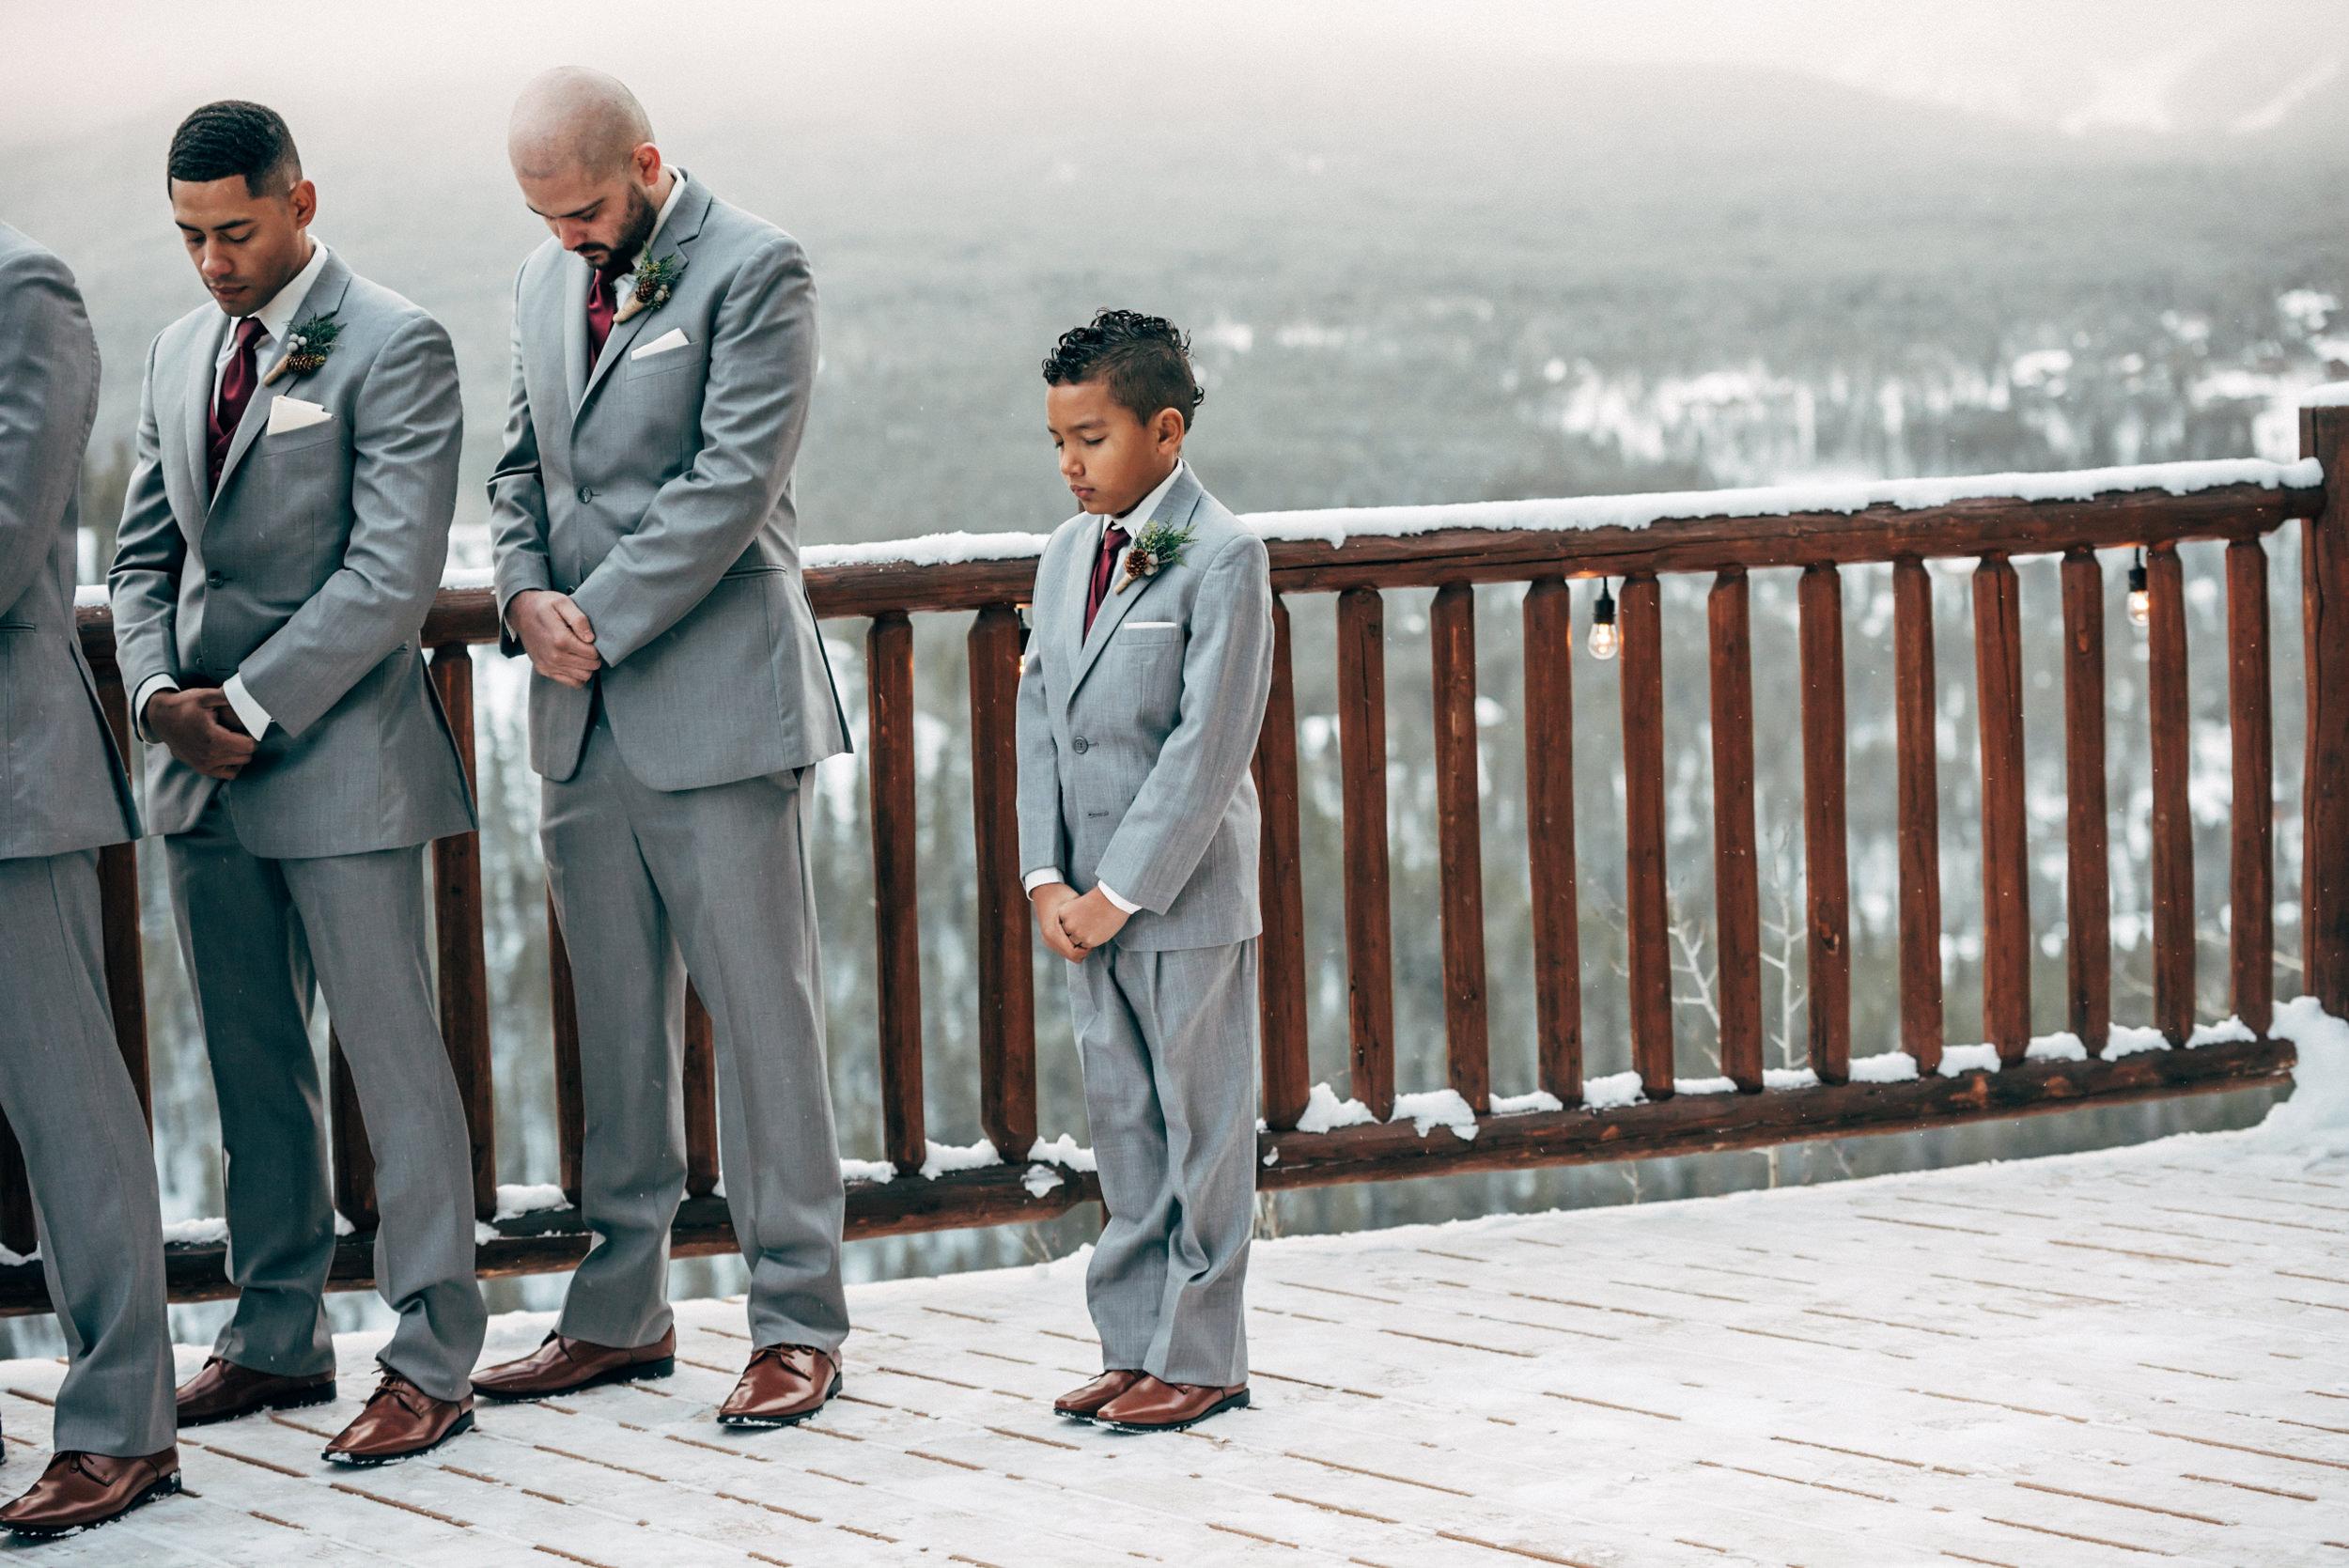 Colorado-Wedding-Photographer-Breckinridge-Mountain-Adventure-Elopement-60.jpg